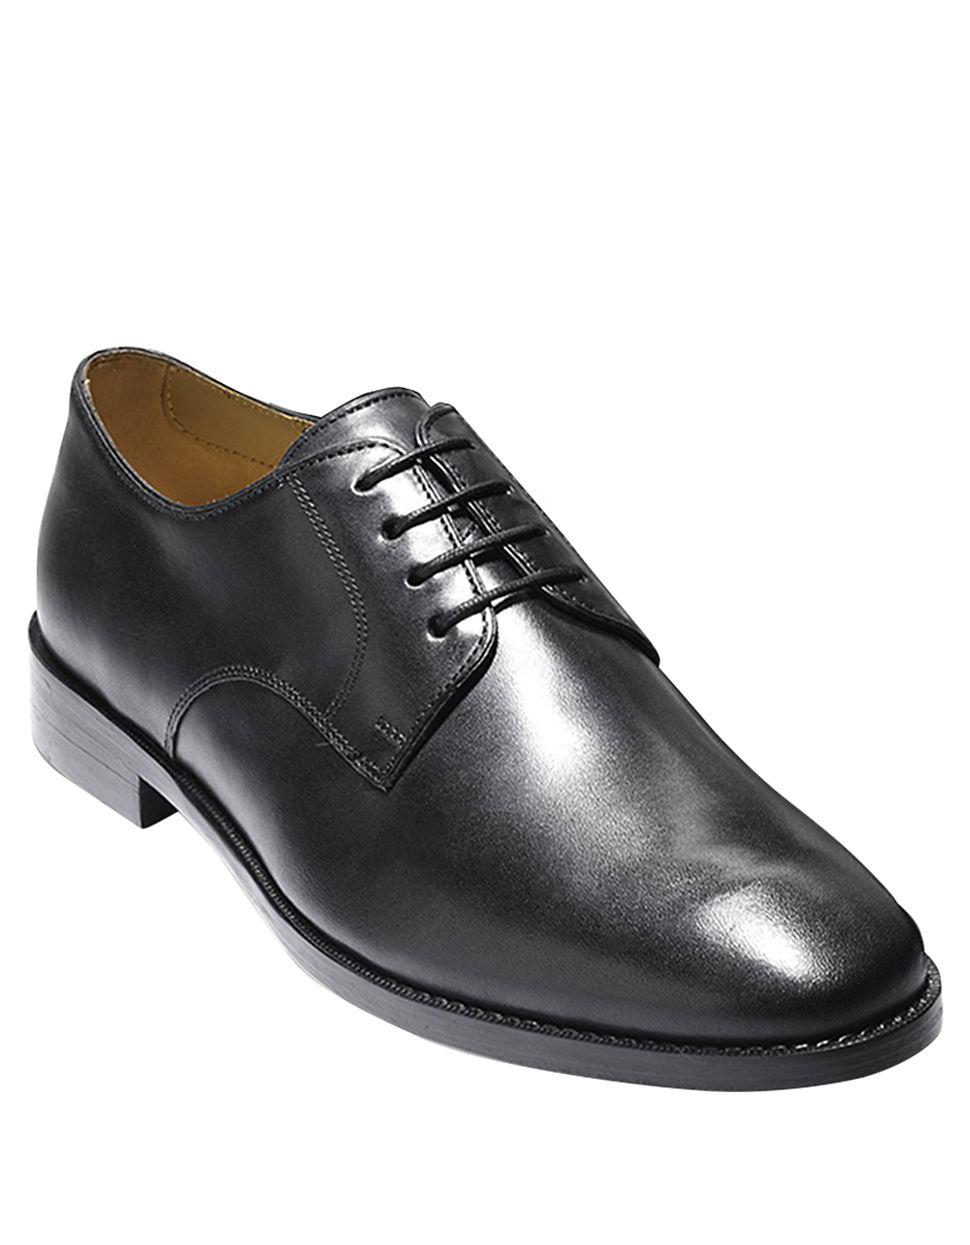 cole-haan-black-cambridge-leather-plain-toe-oxfords-product-0-819942676-normal